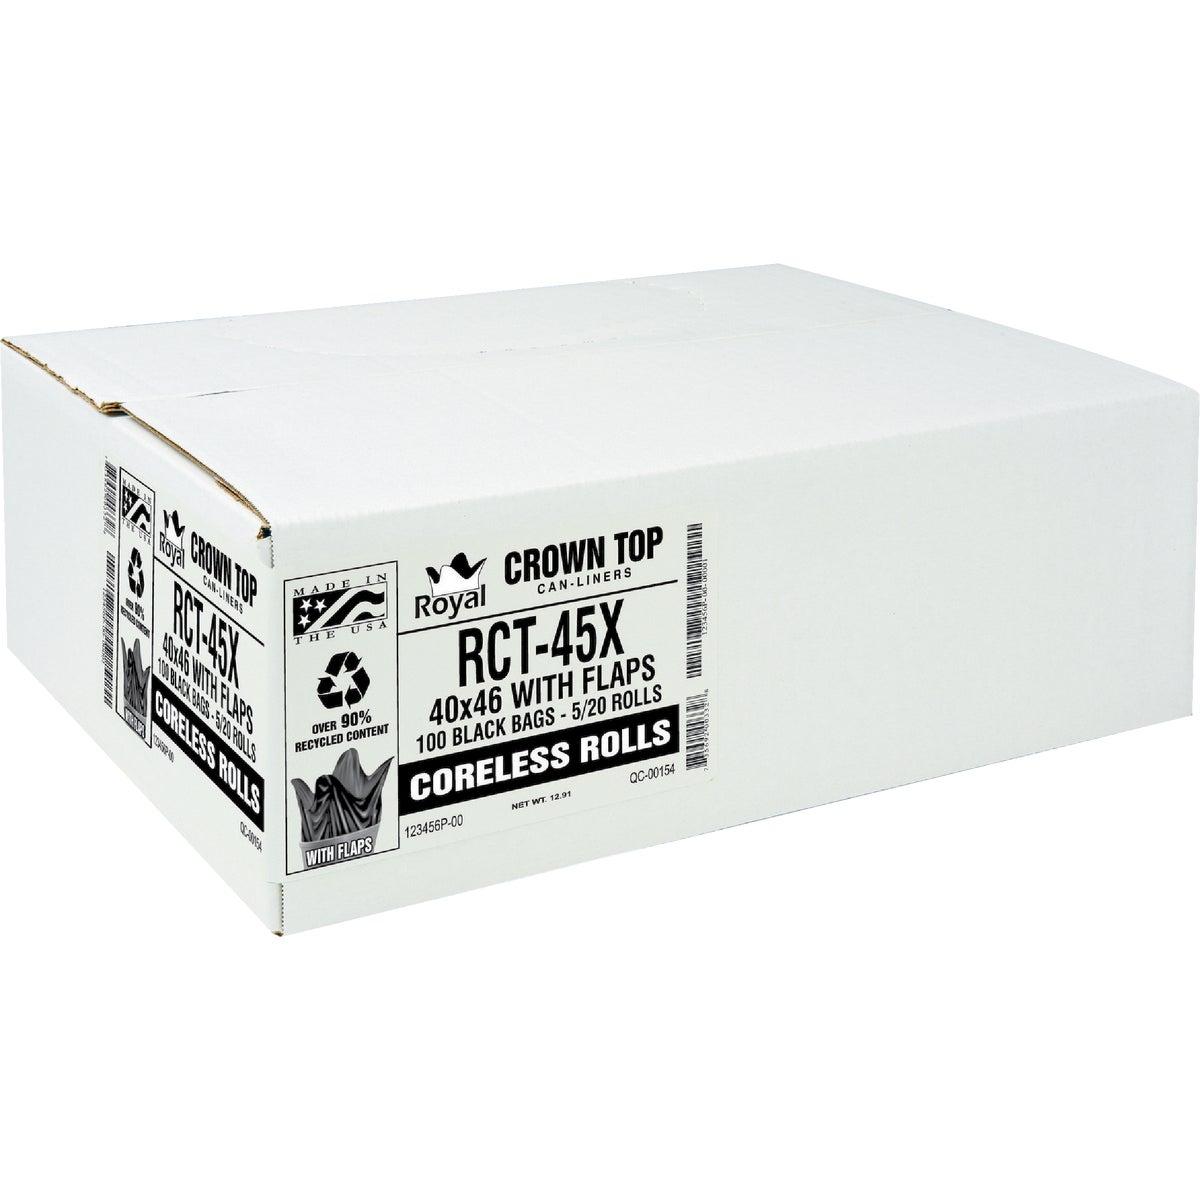 40X47 XH BLACK CAN LINER - RL-4047XH by Aluf Plastics Incom